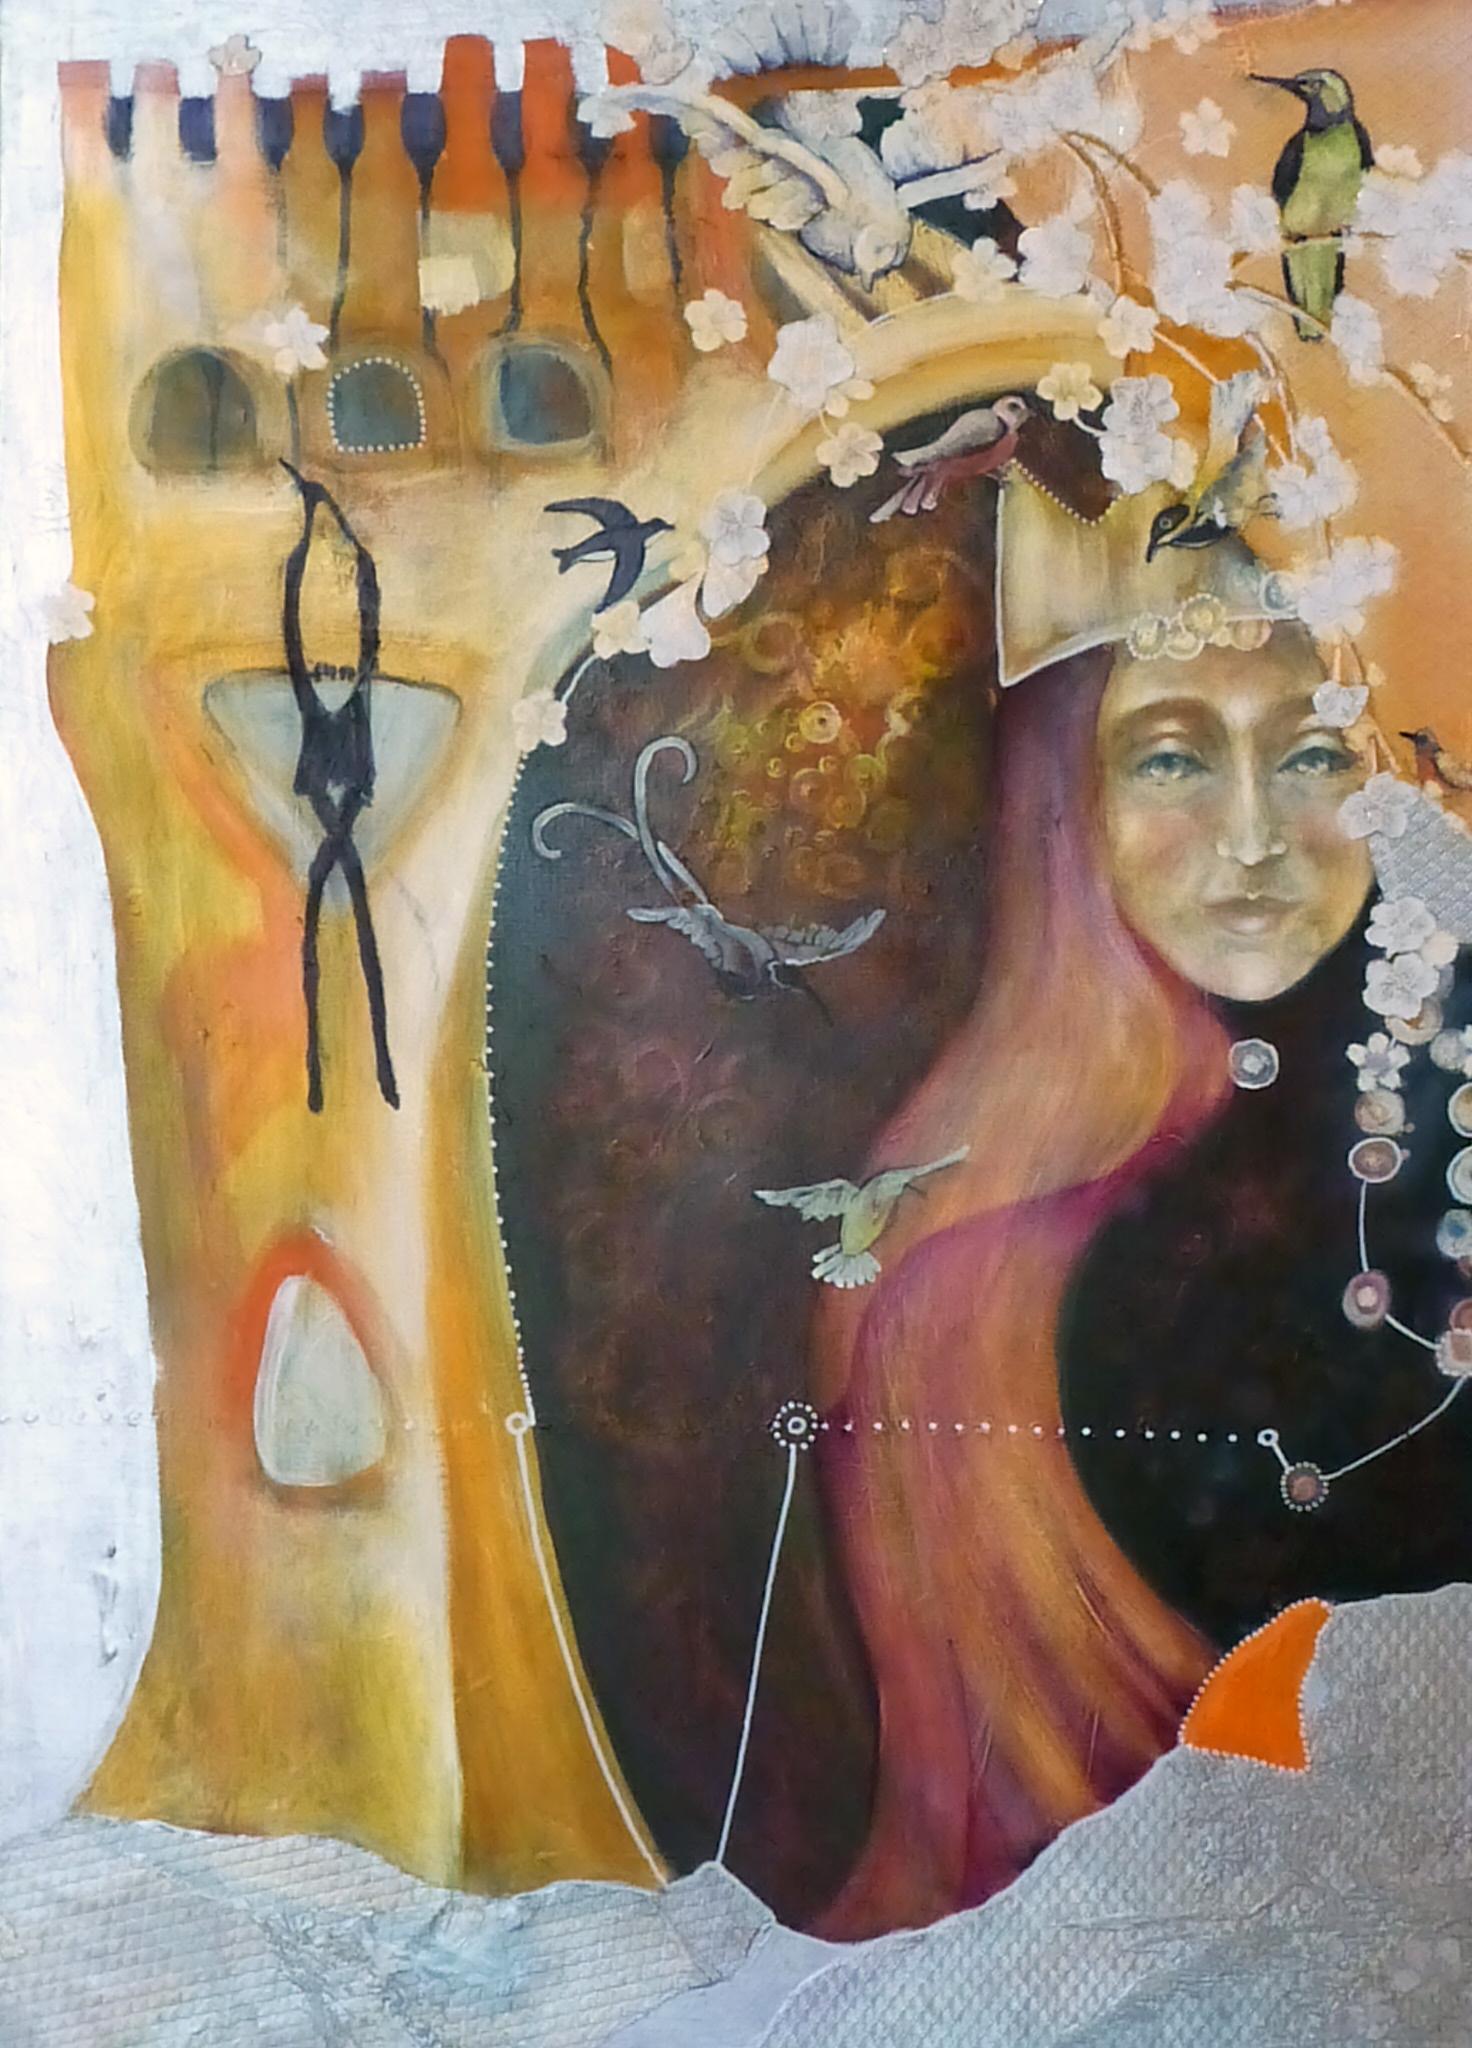 """Königin"", Acryl auf Leinwand, 70x100cm, 2011"